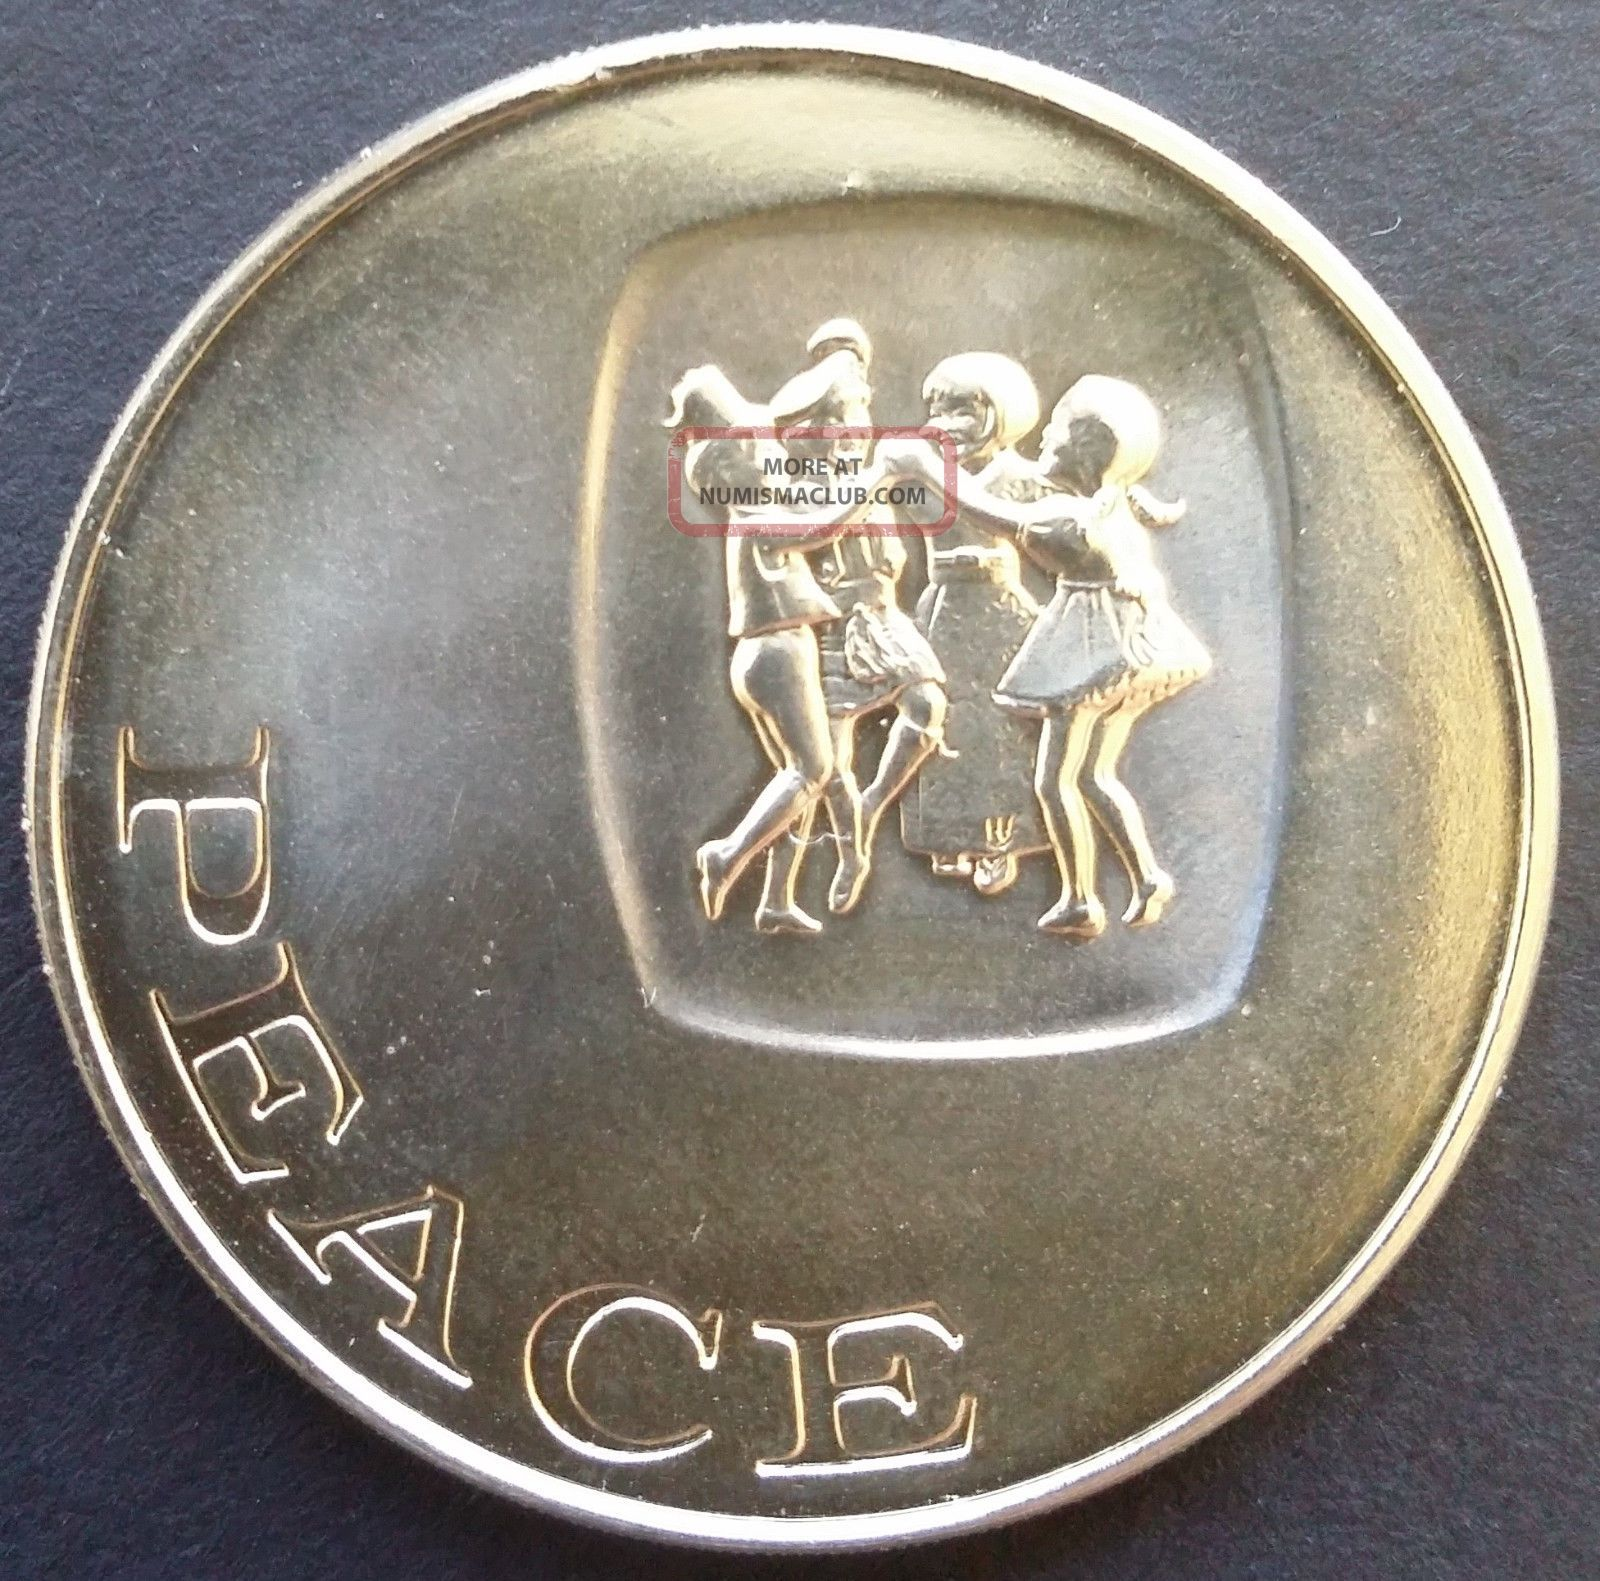 1968 Limited Edition Franklin Peace Medal Exonumia photo